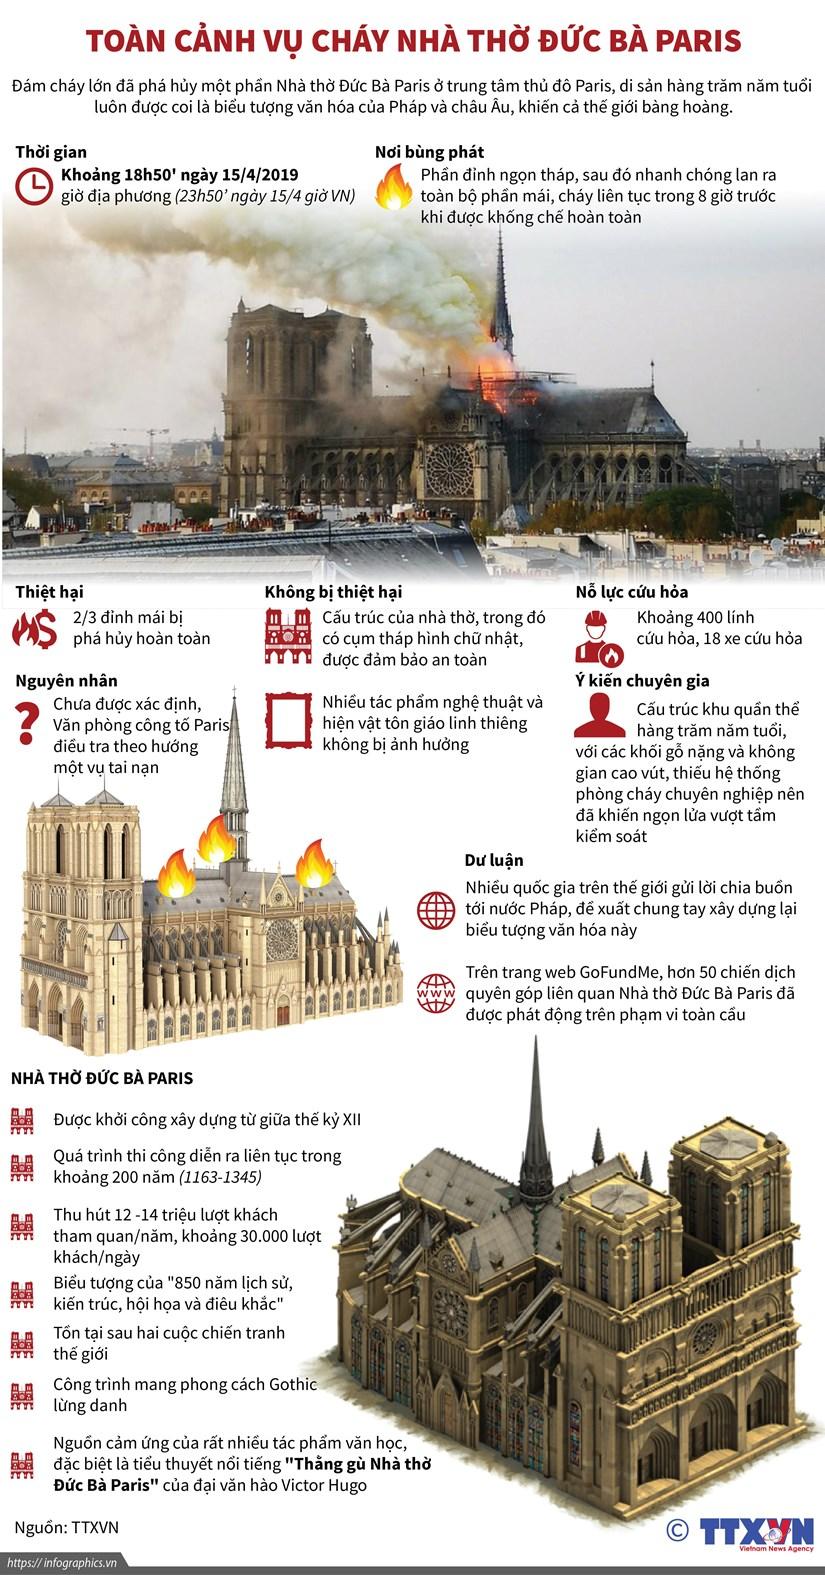 [Infographics] Toan canh vu chay Nha tho Duc Ba Paris hinh anh 1